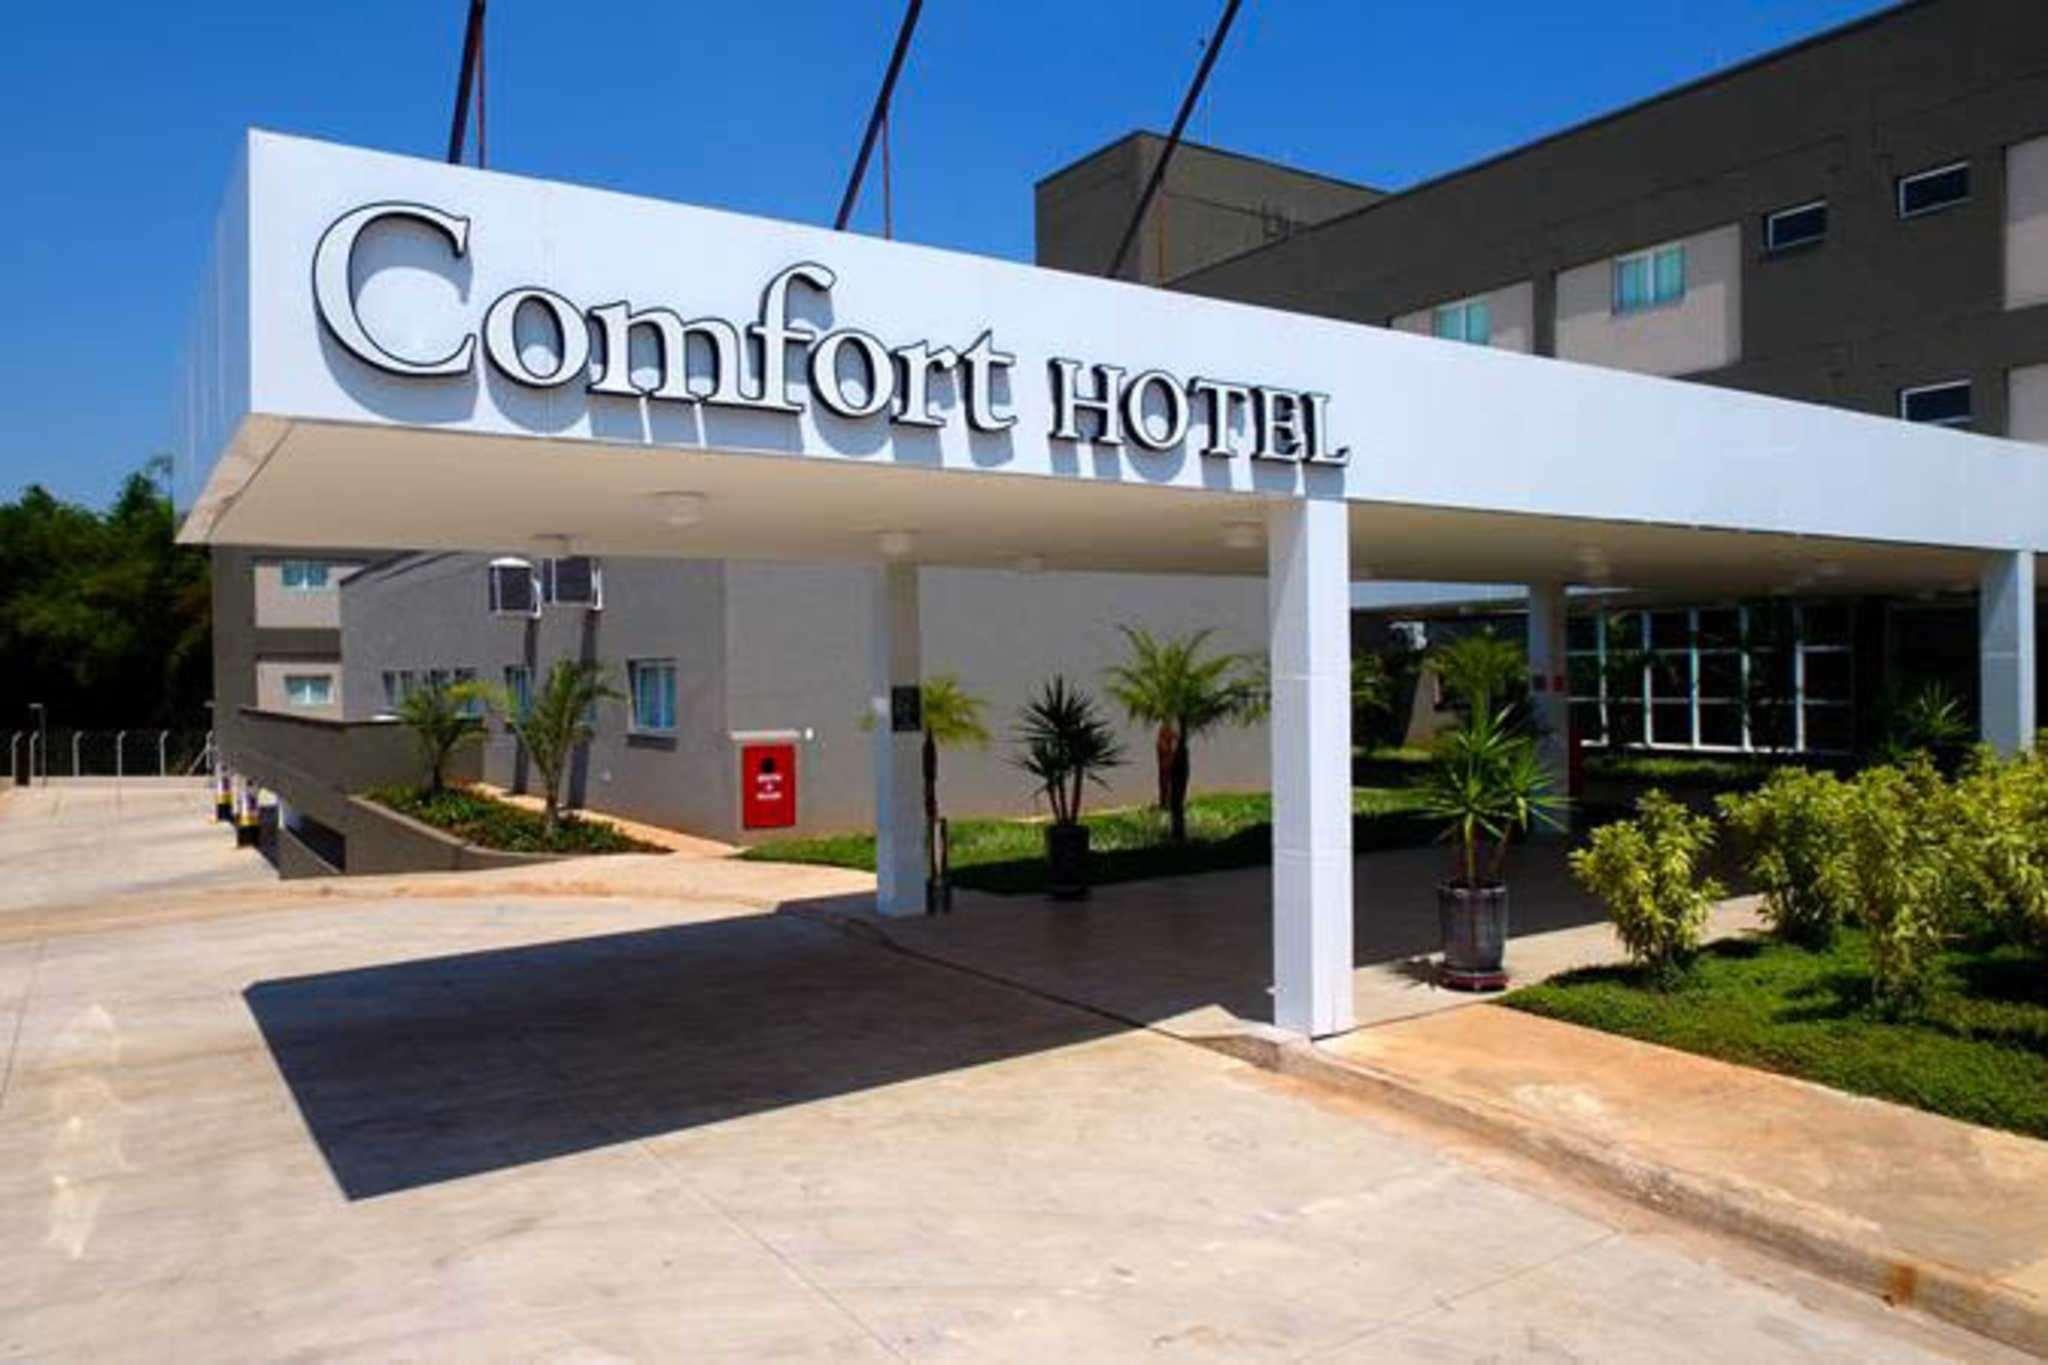 Comfort Hotel Mogi Guacu